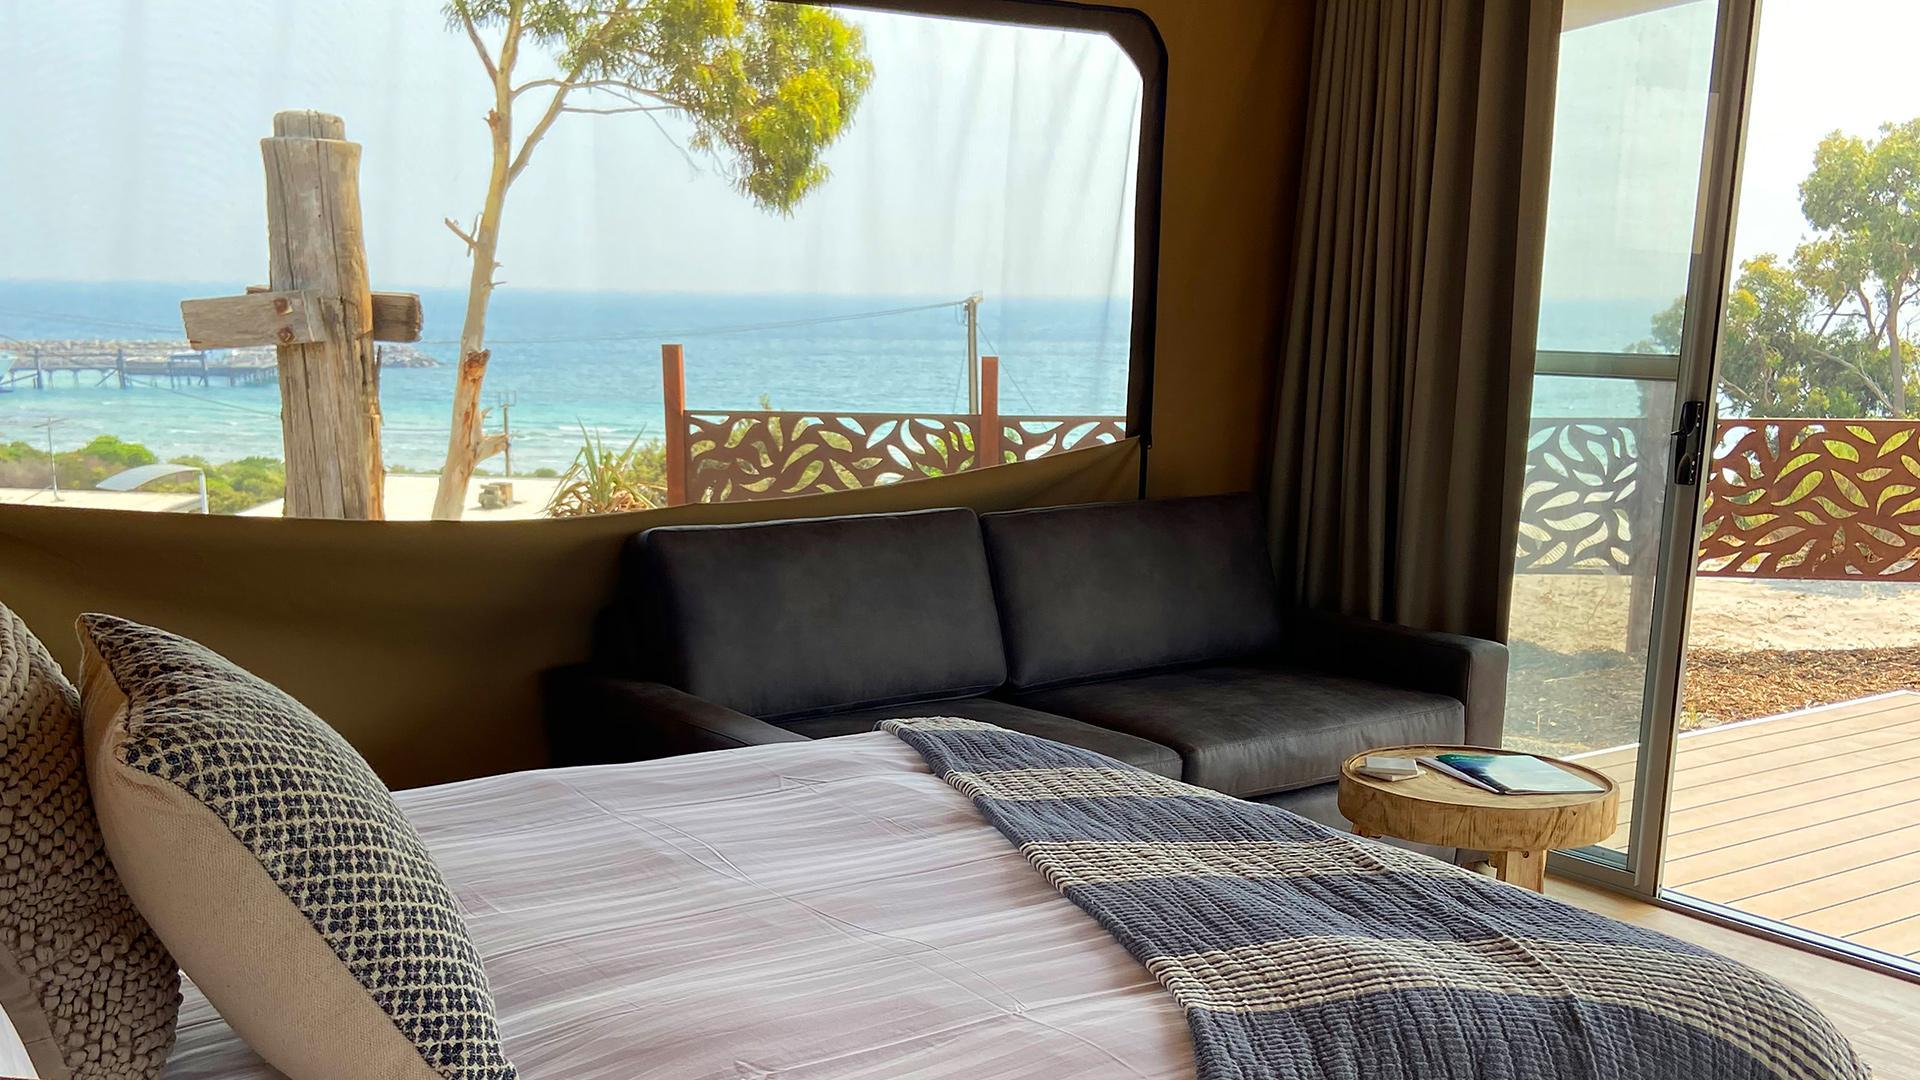 Eco-Luxury Tent image 1 at Seafront Kangaroo Island by Kangaroo Island Council, South Australia, Australia